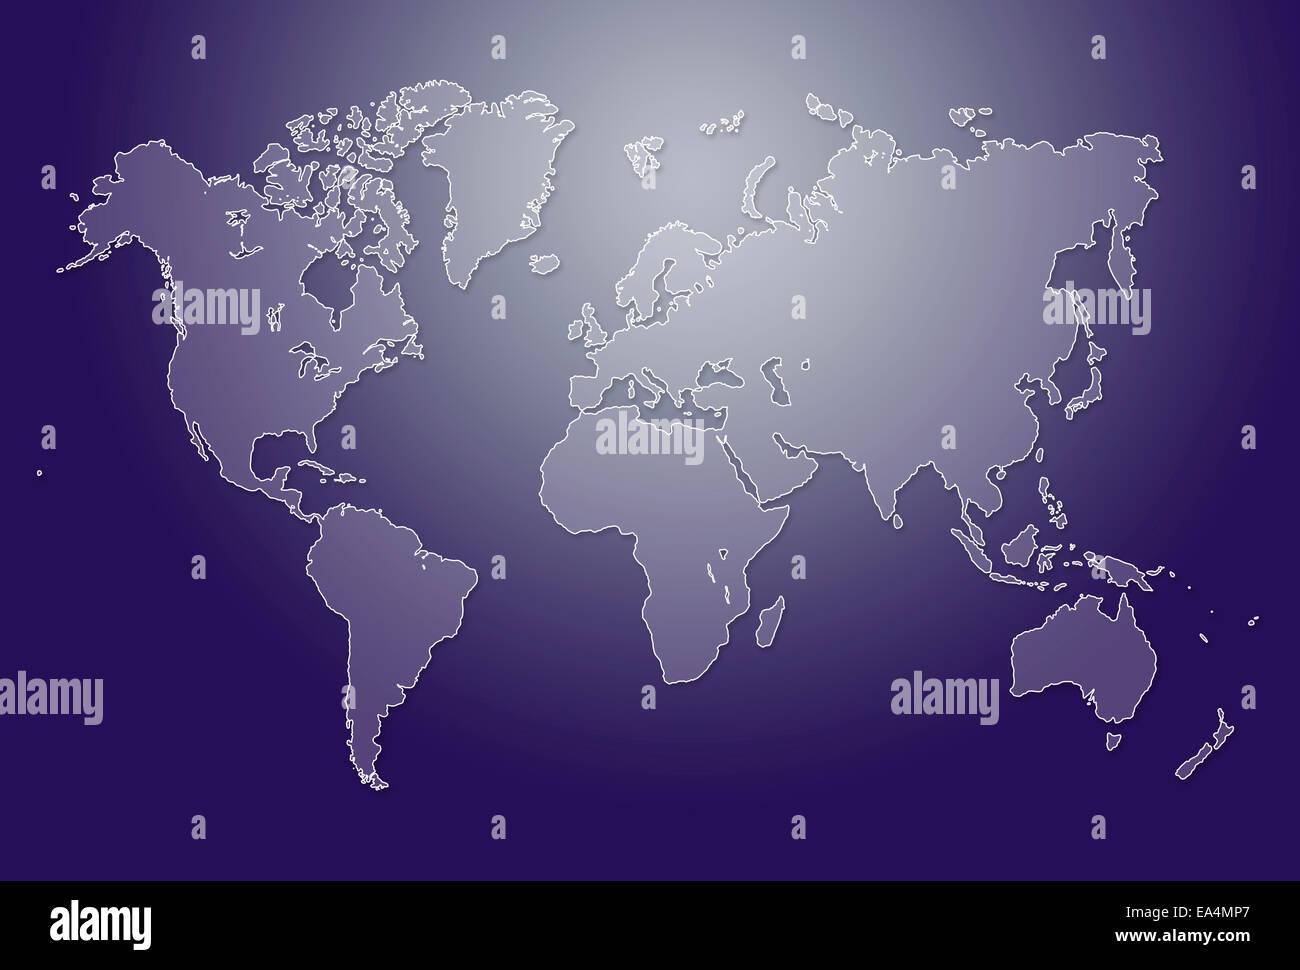 Image of modern world map illustration - Stock Image